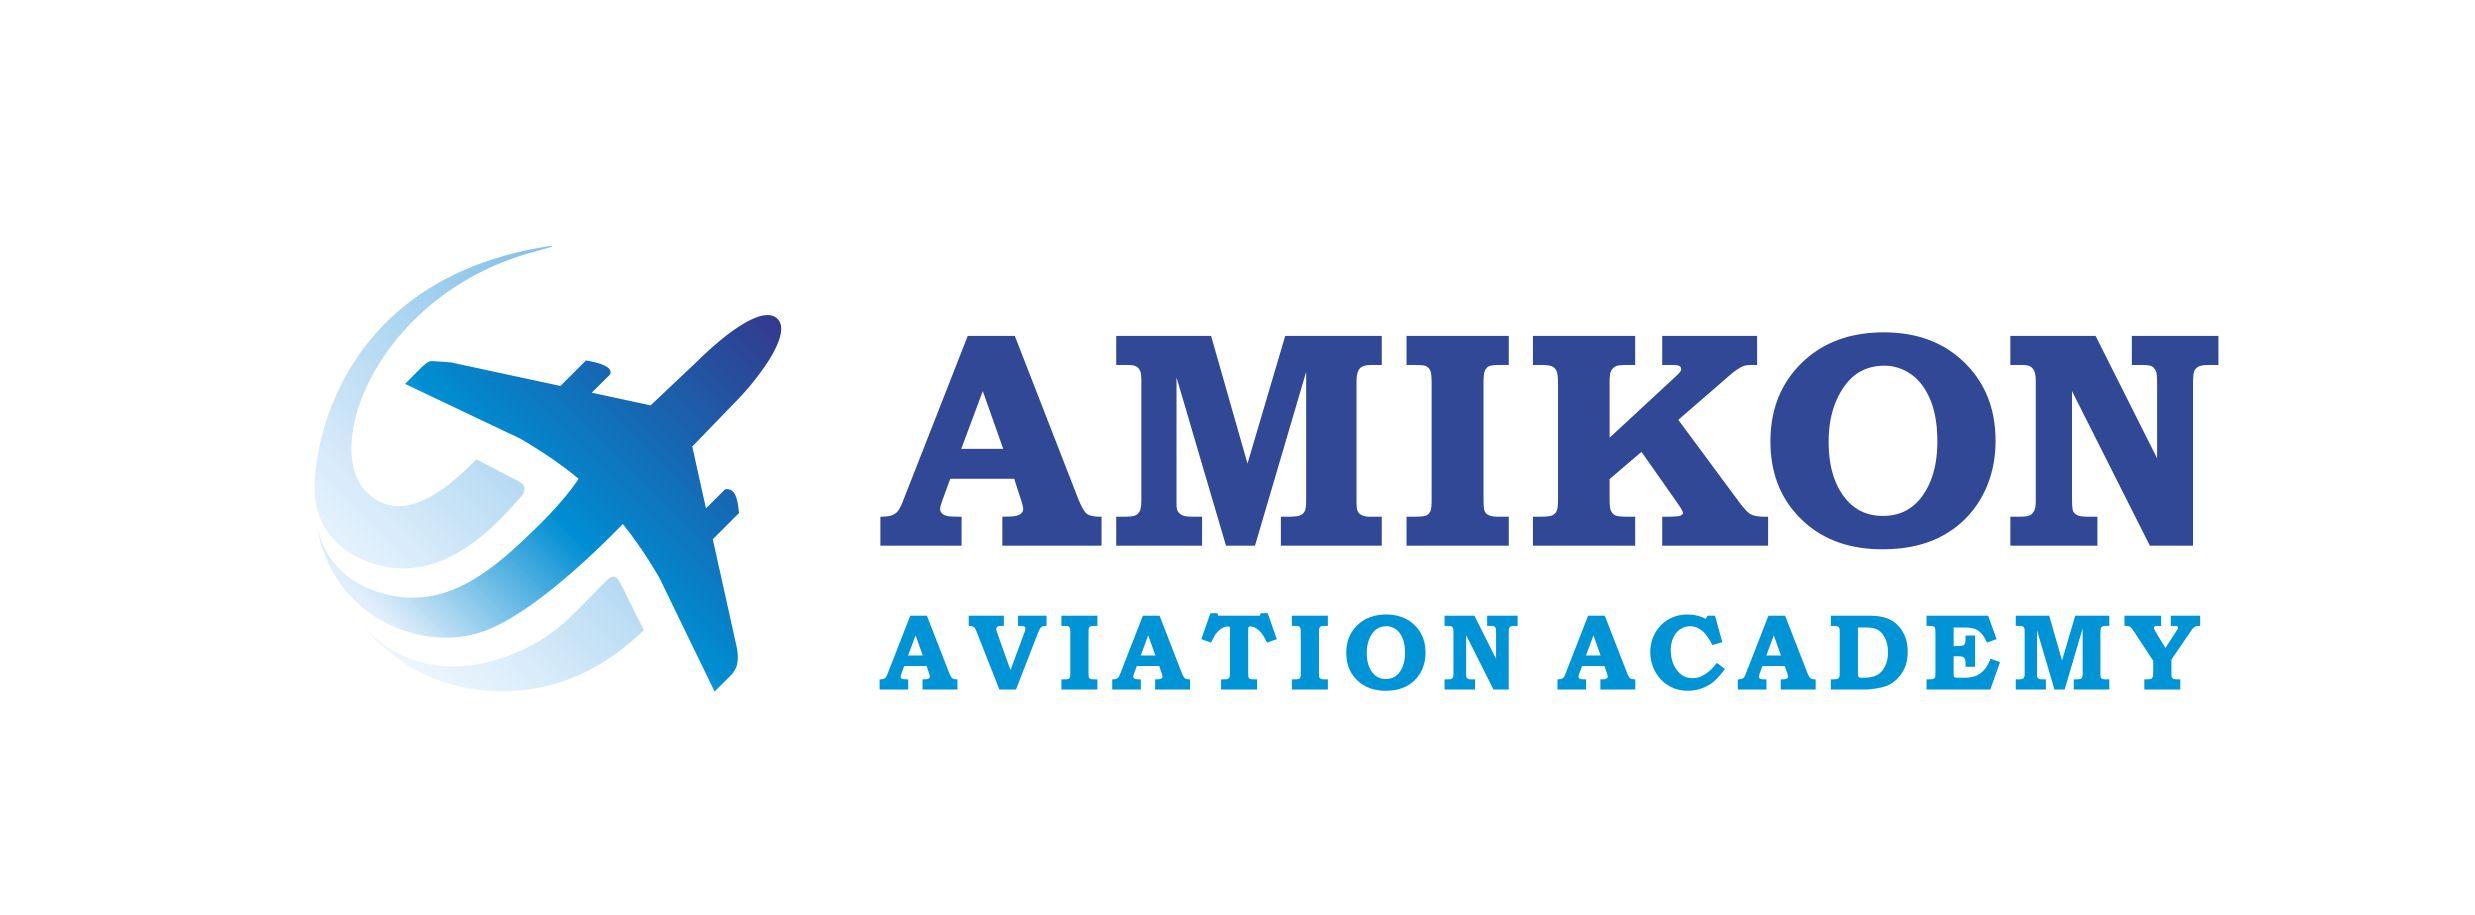 Amikon Logo photo - 1